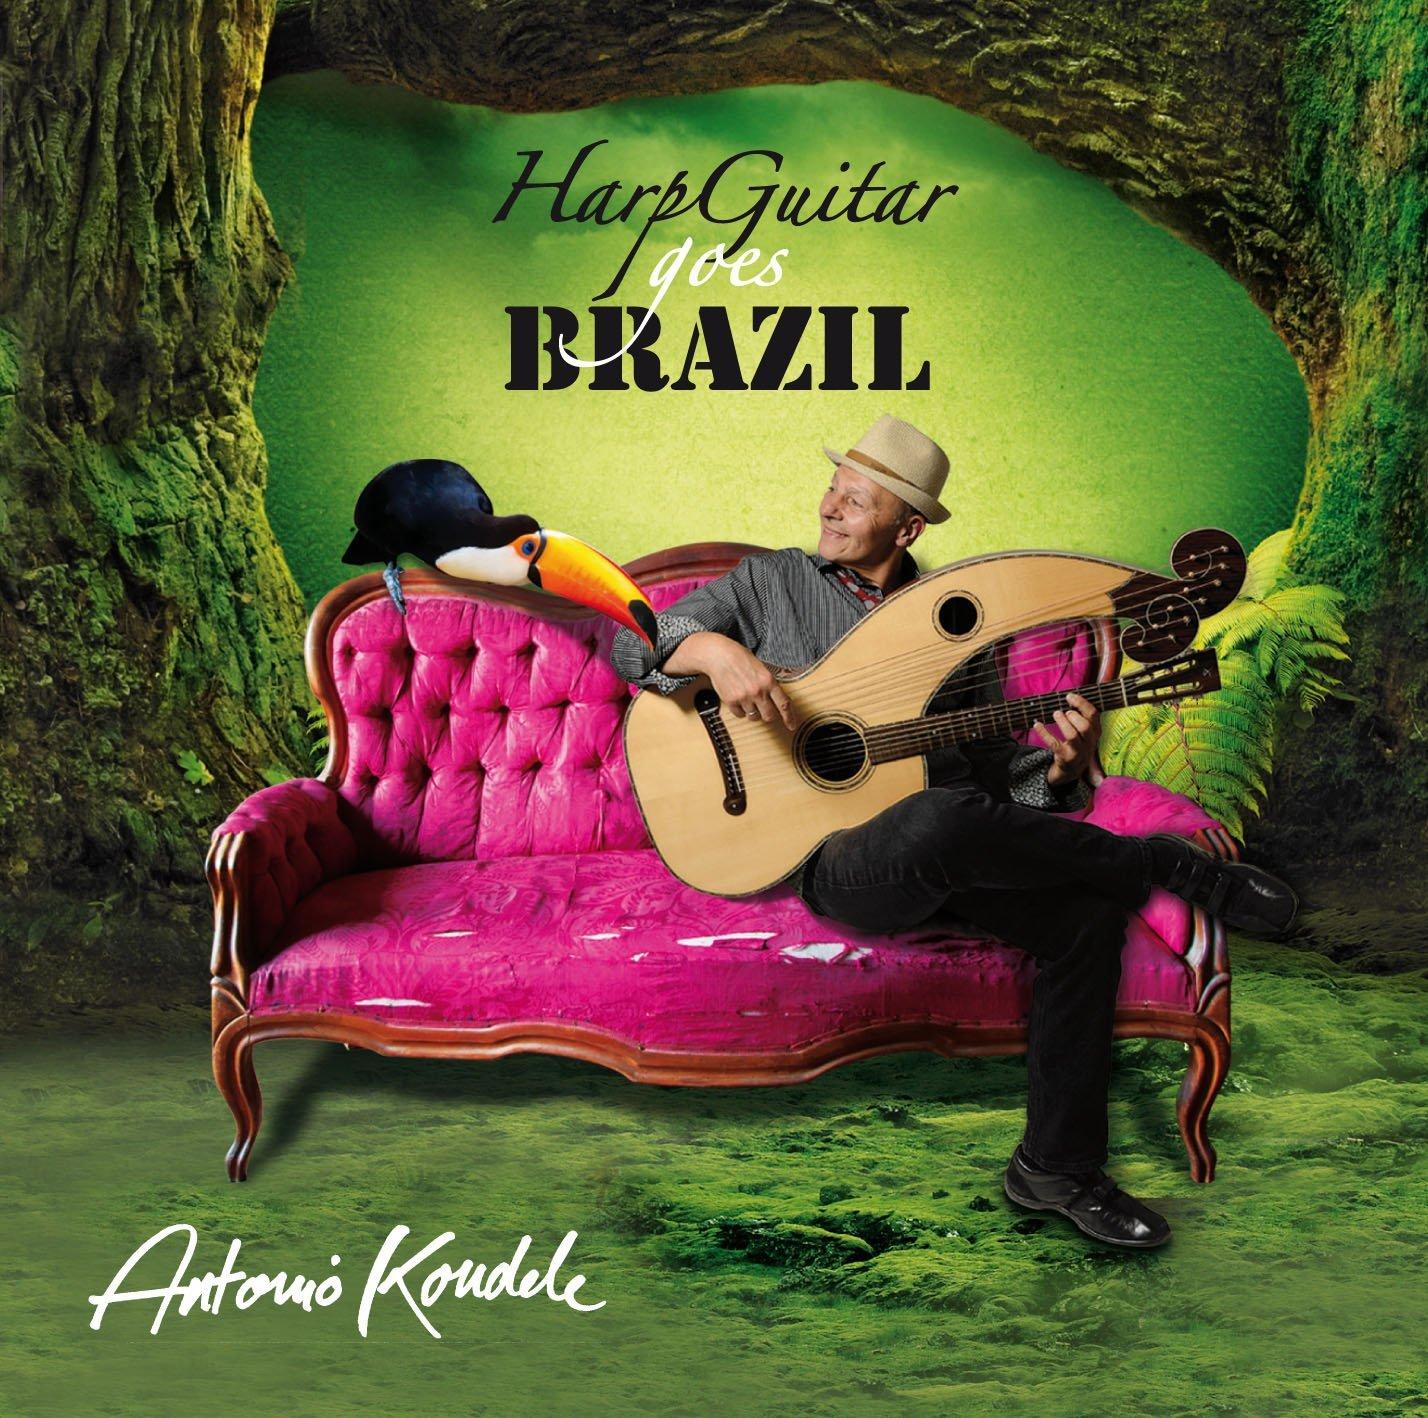 HarpGuitarGoesBrazil_AntonioKoudele_2015_Cover